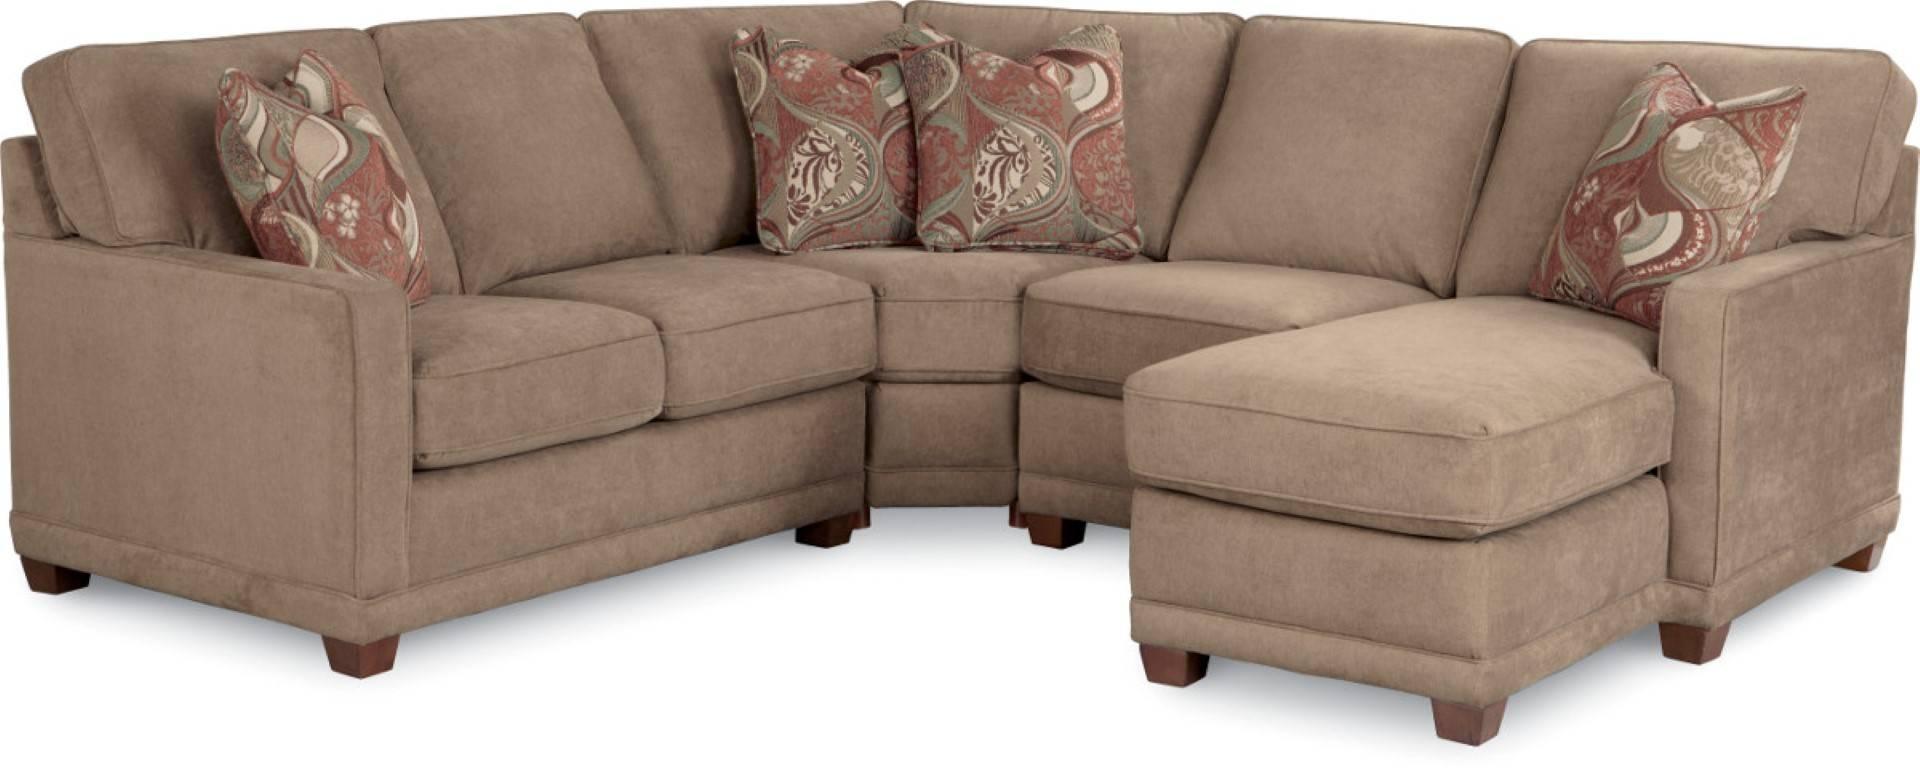 Custom Cushions Chicago | Cushions Decoration for Lazyboy Sectional Sofa (Image 3 of 25)